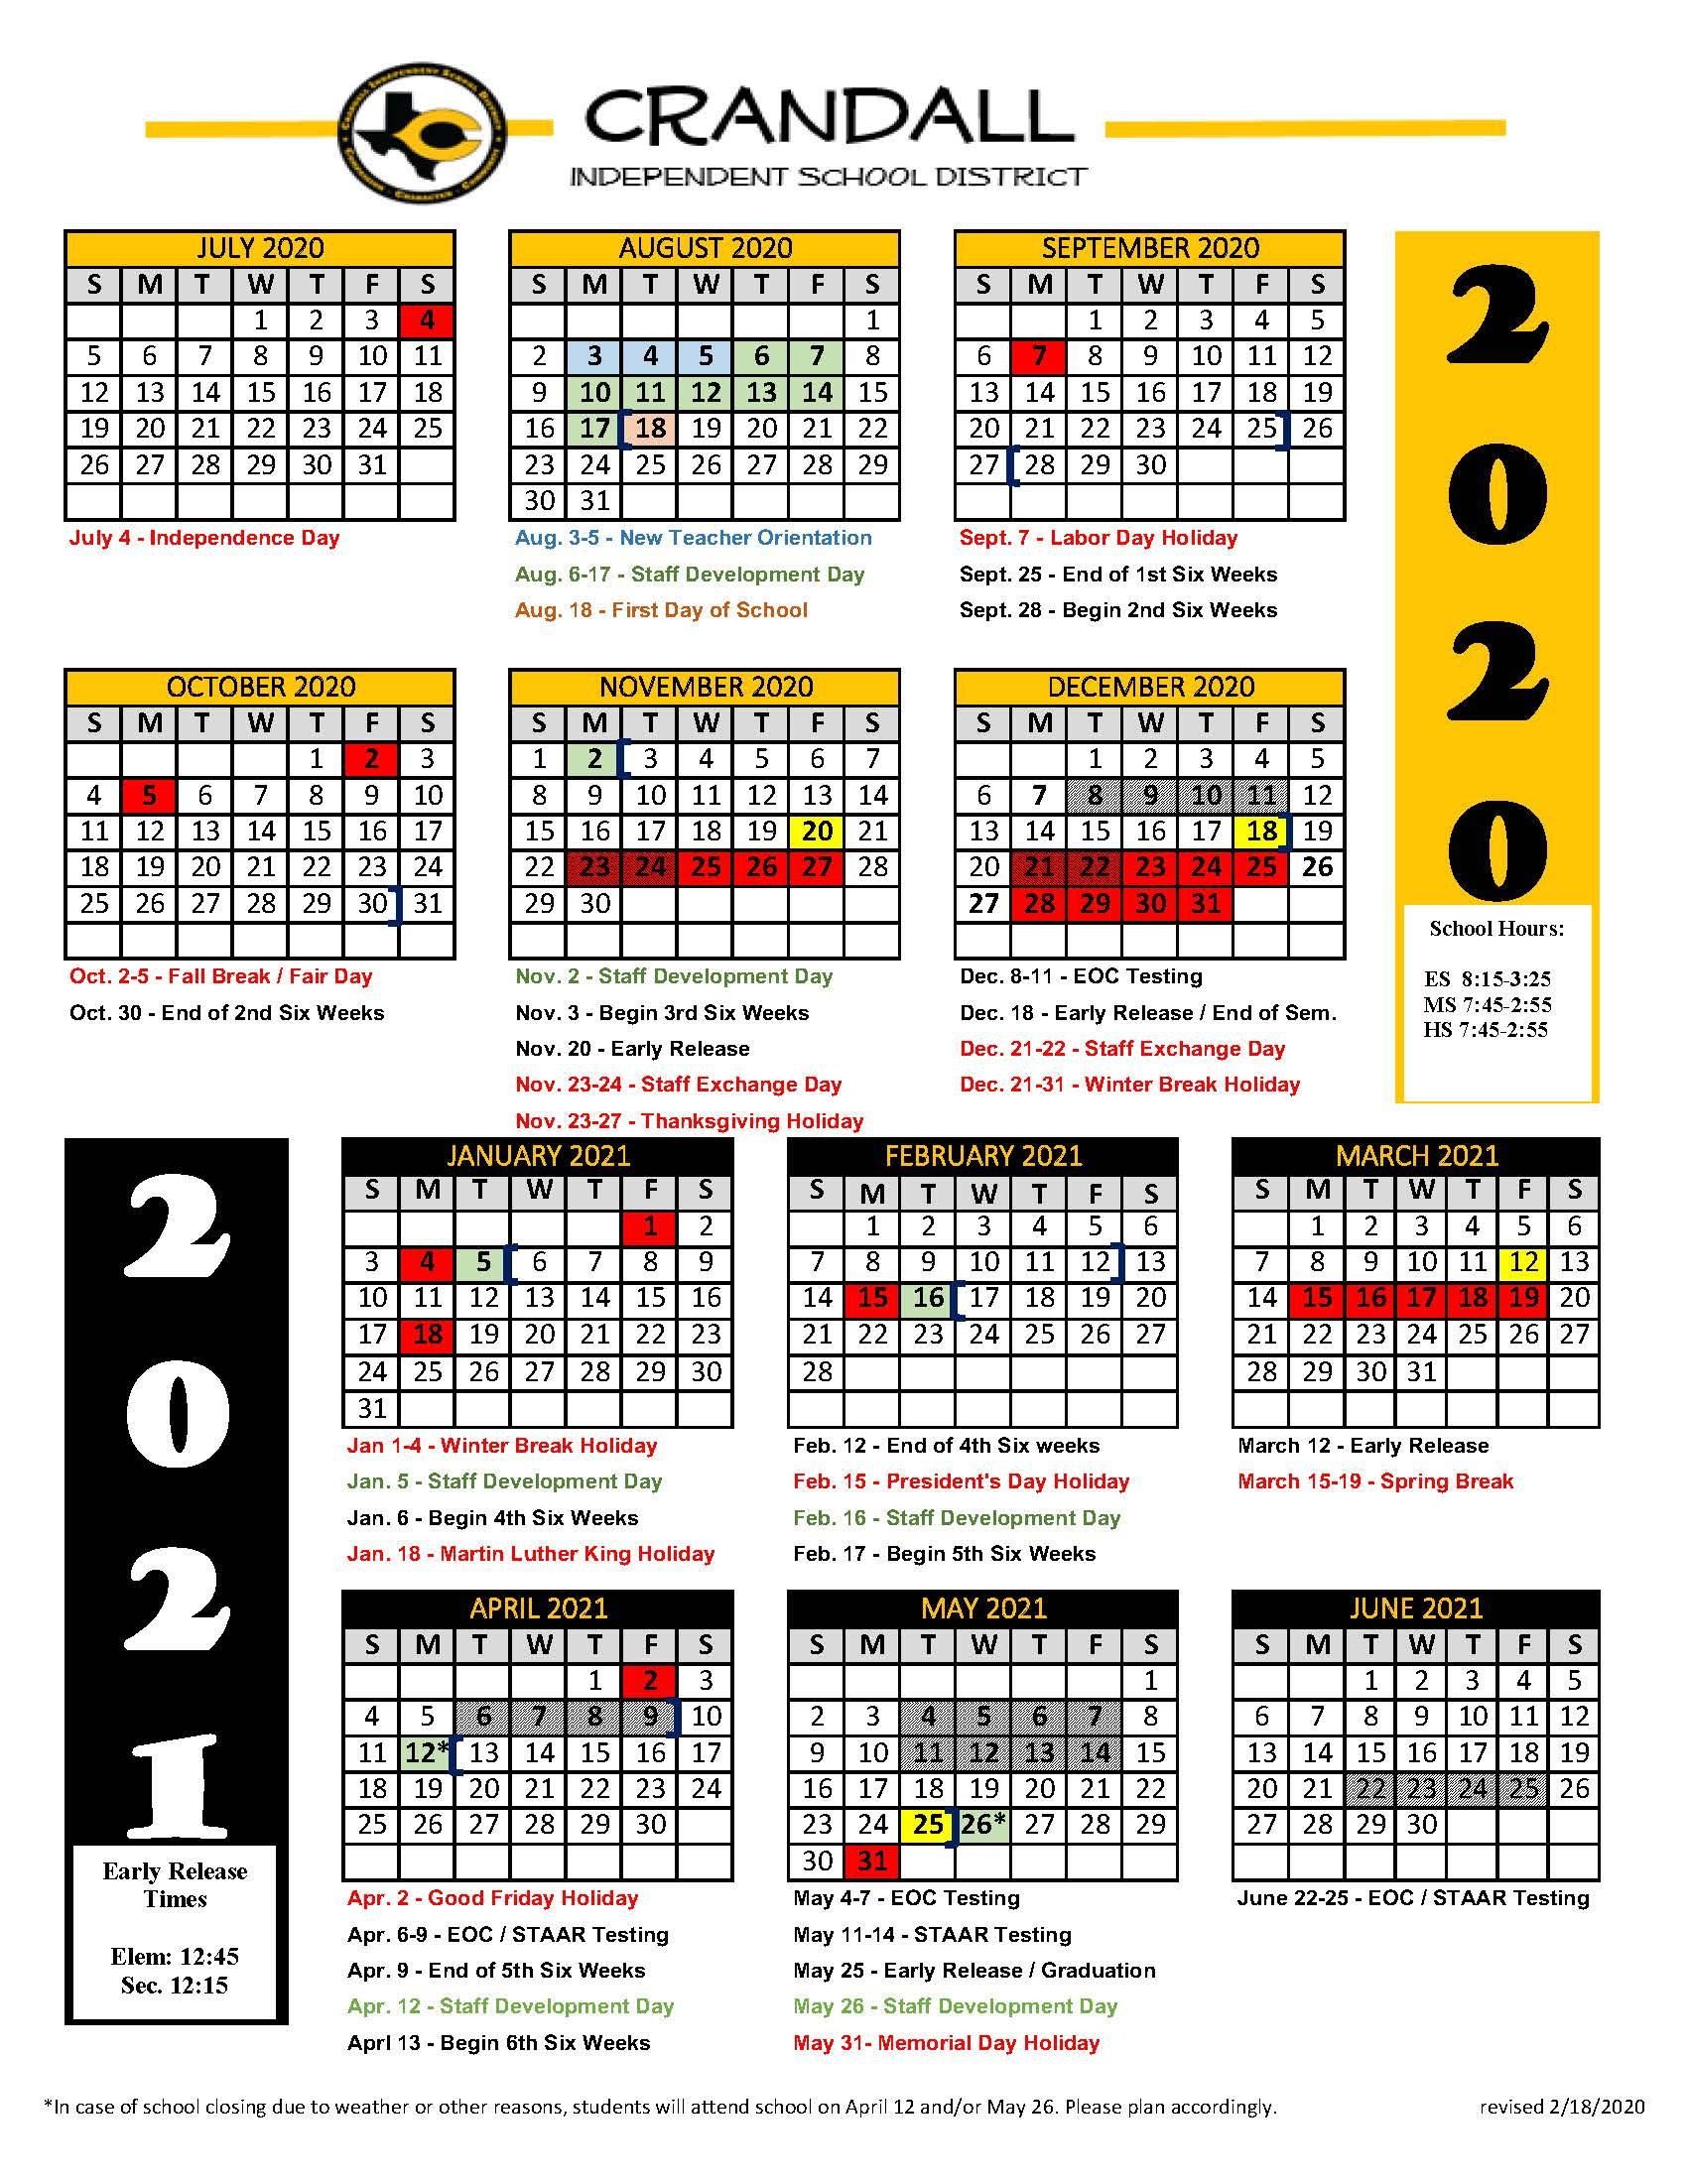 Uisd Calendar 2021 - January 2021